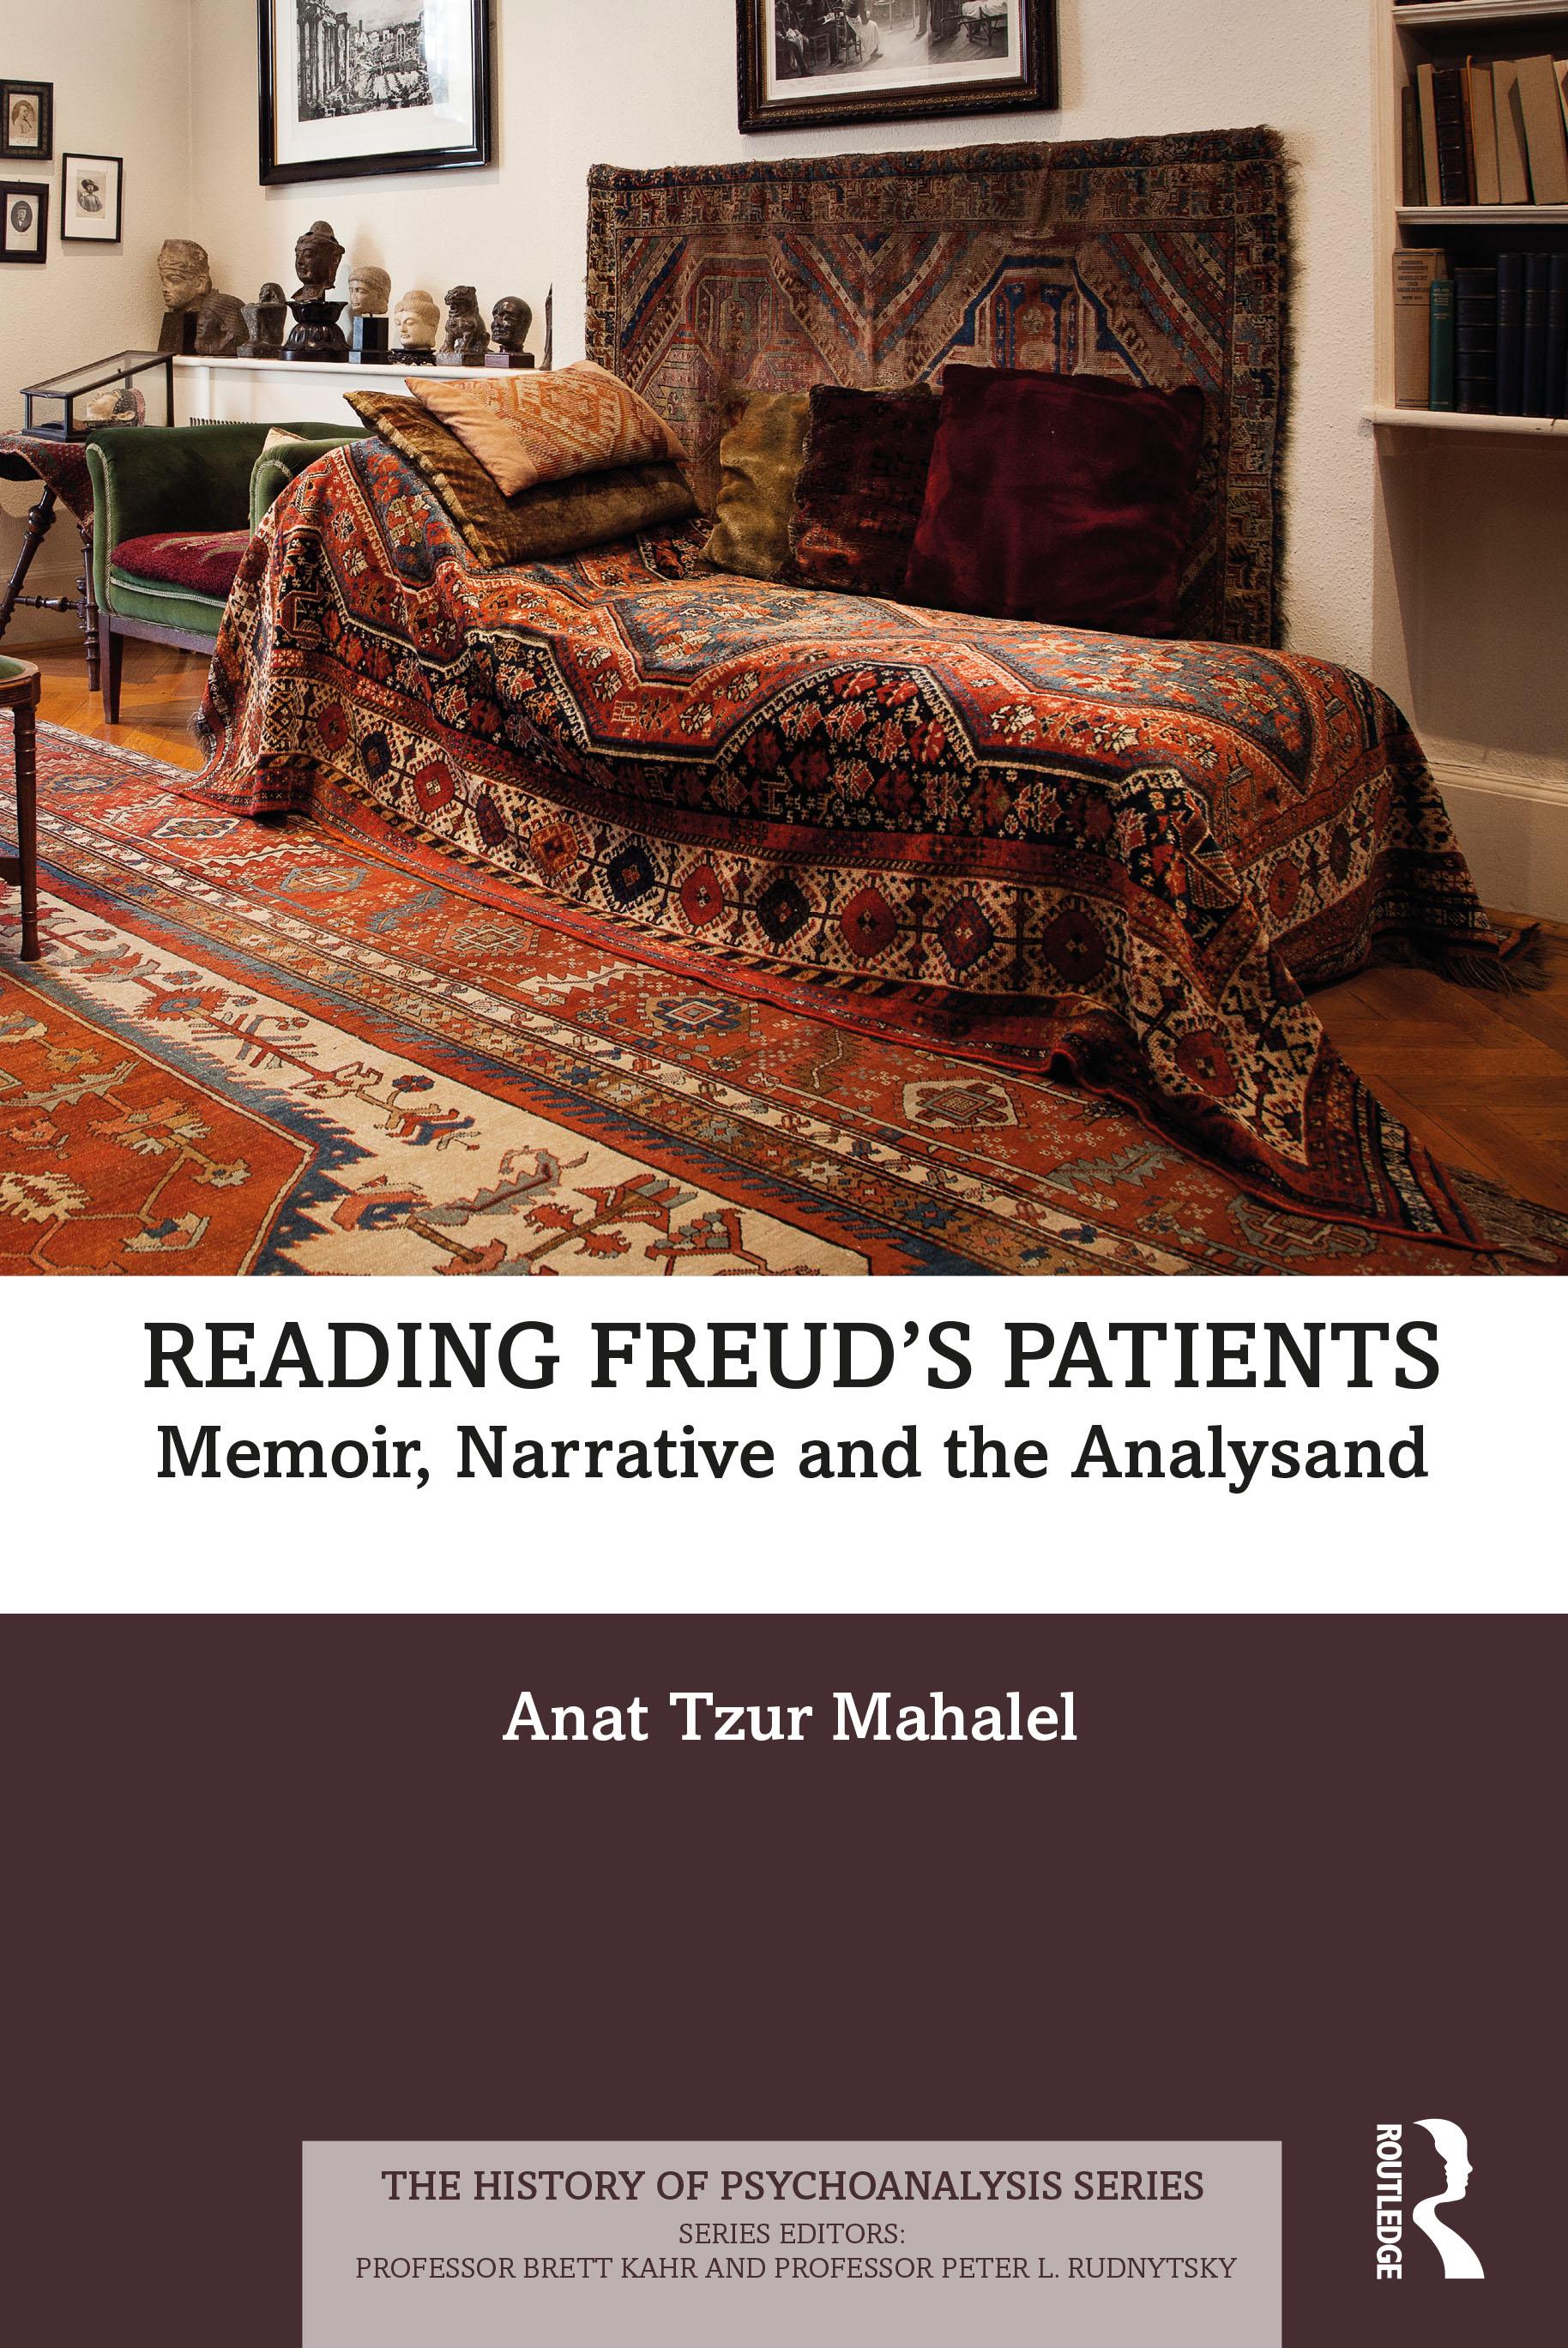 Reading Freud's Patients